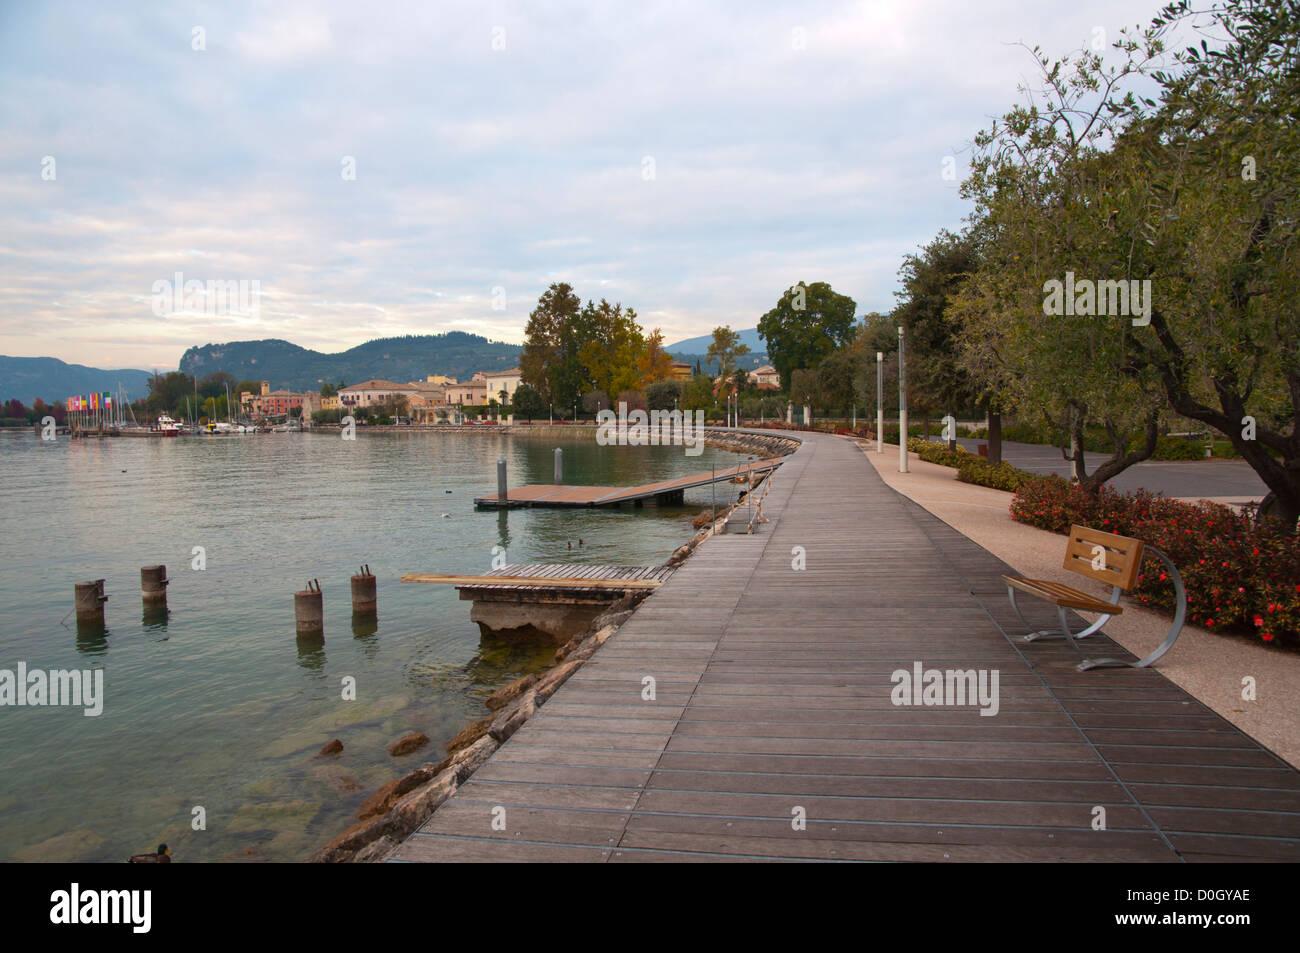 Am See promenade während Herbst Bardelino Stadt Lago di Garda am Gardasee Venetien Italien Europa Stockbild